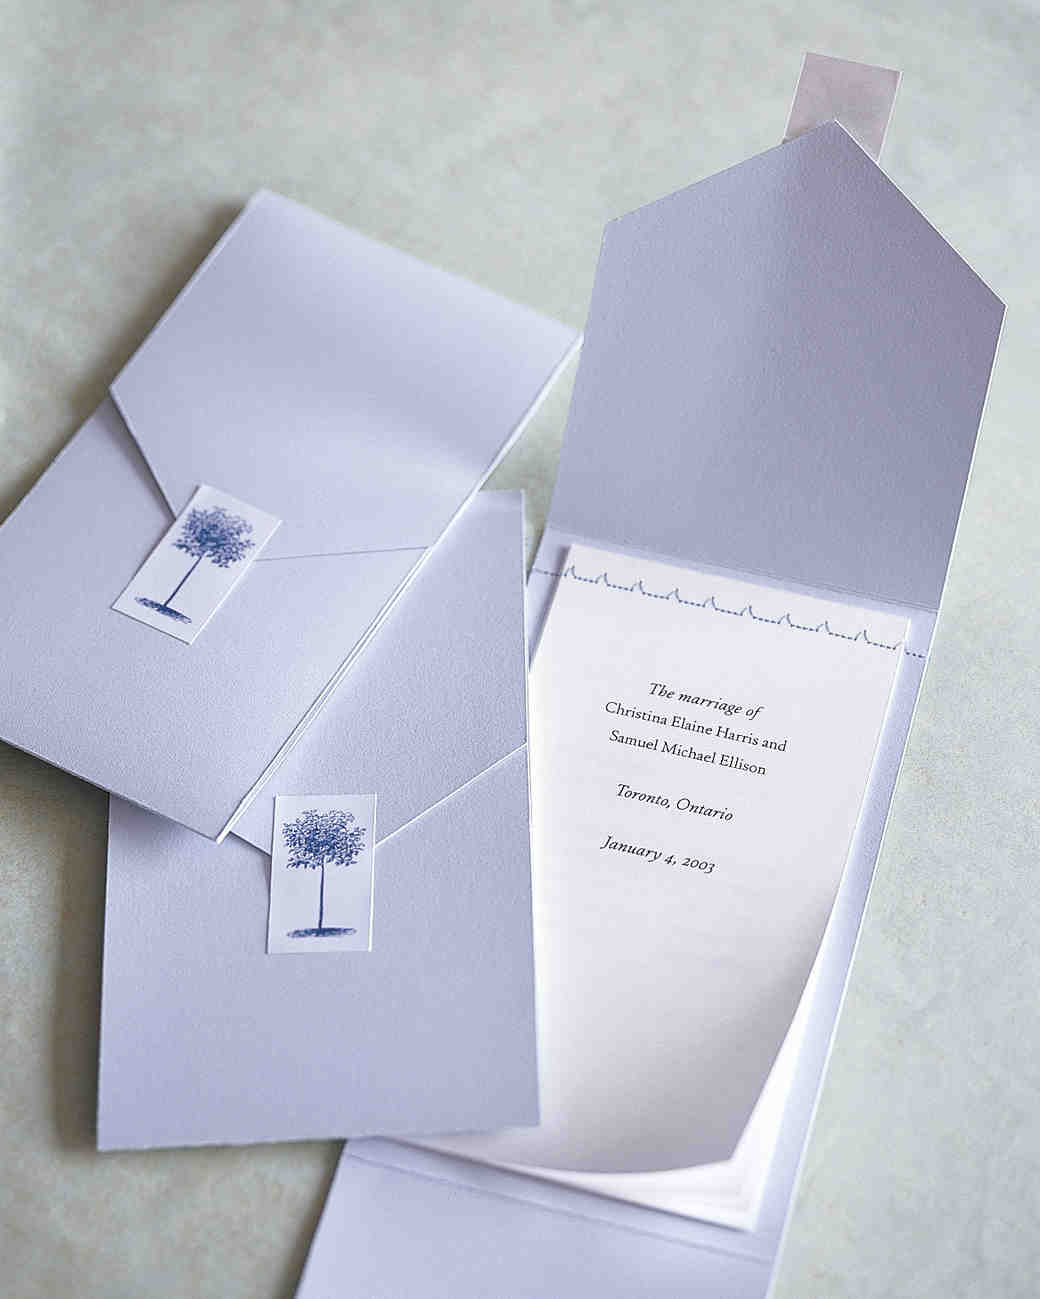 diy-wedding-ceremony-programs-ml083a06-0515.jpg